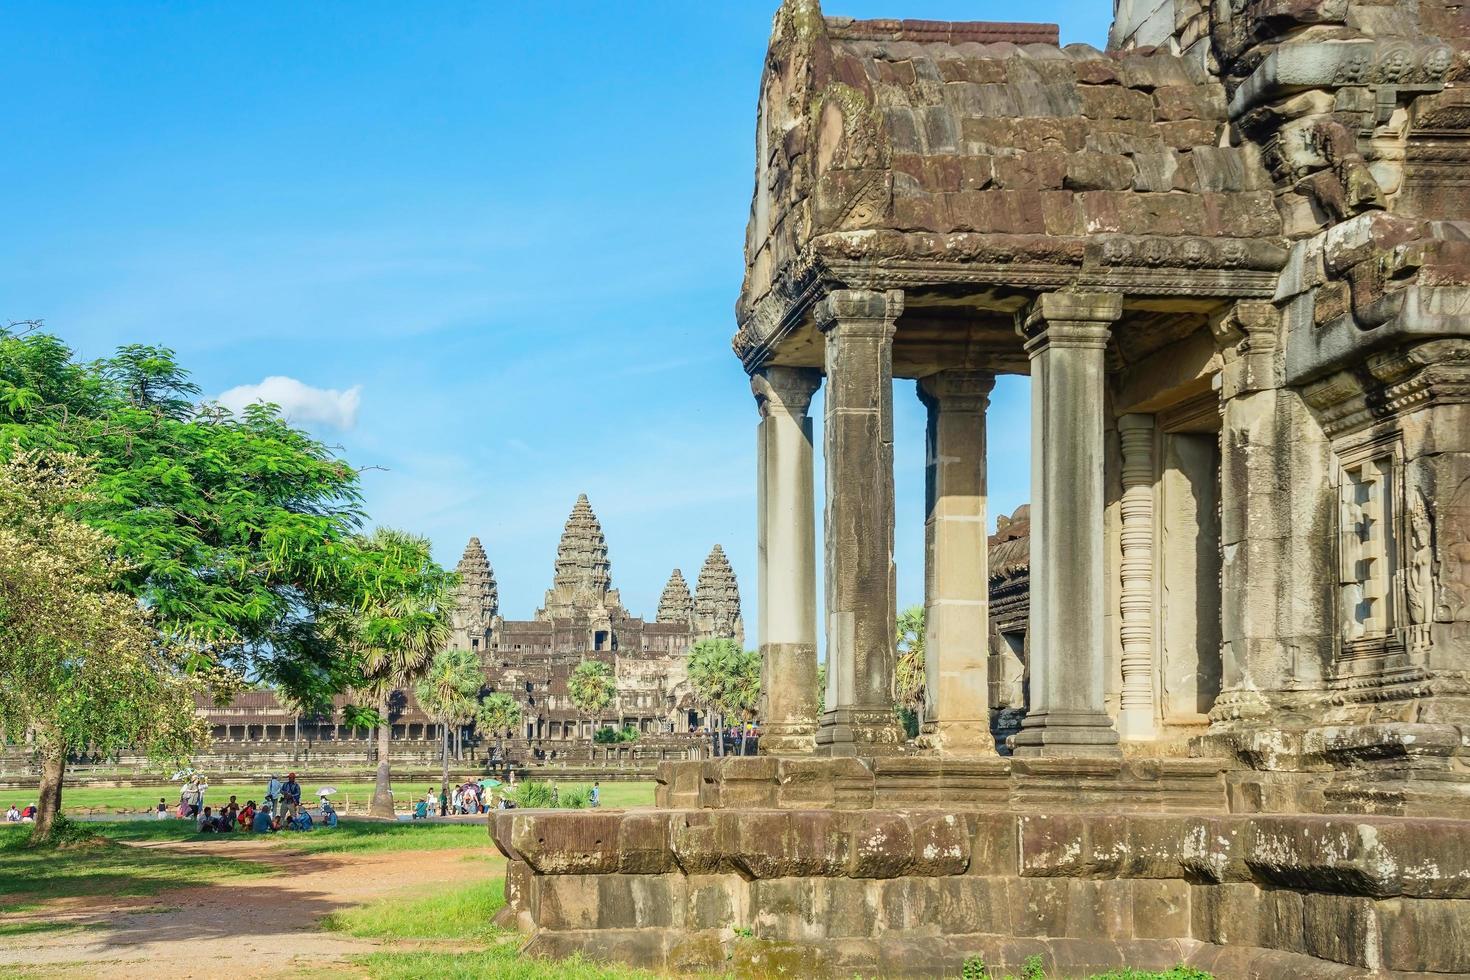 Les gens au temple d'Angkor Wat, Siem Reap, Cambodge photo